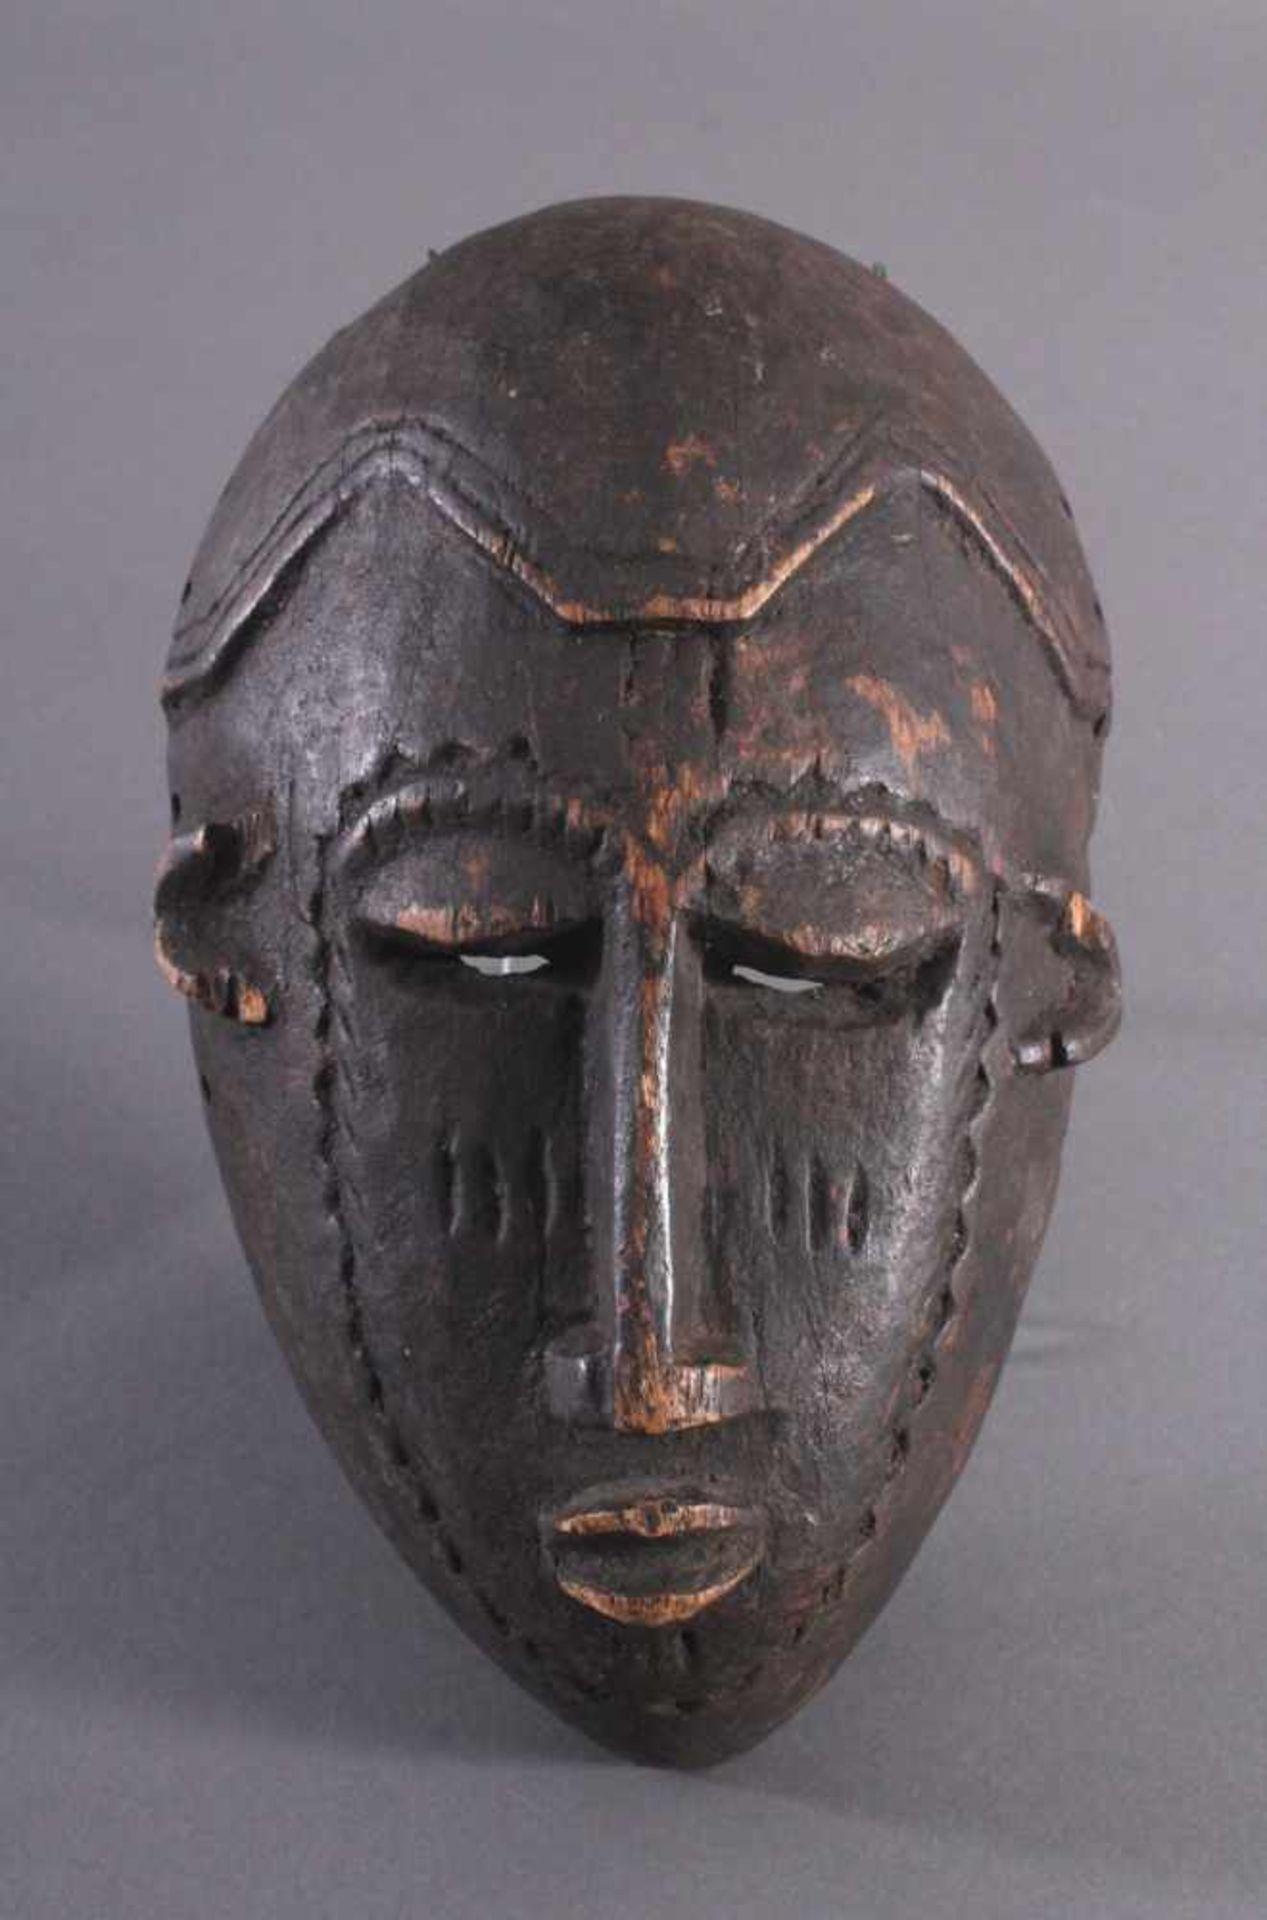 Antike Maske, Kwele-GabunHolz, geschnitzt, dunkle Patina, Narbentatauierung, ca. L-27 cm